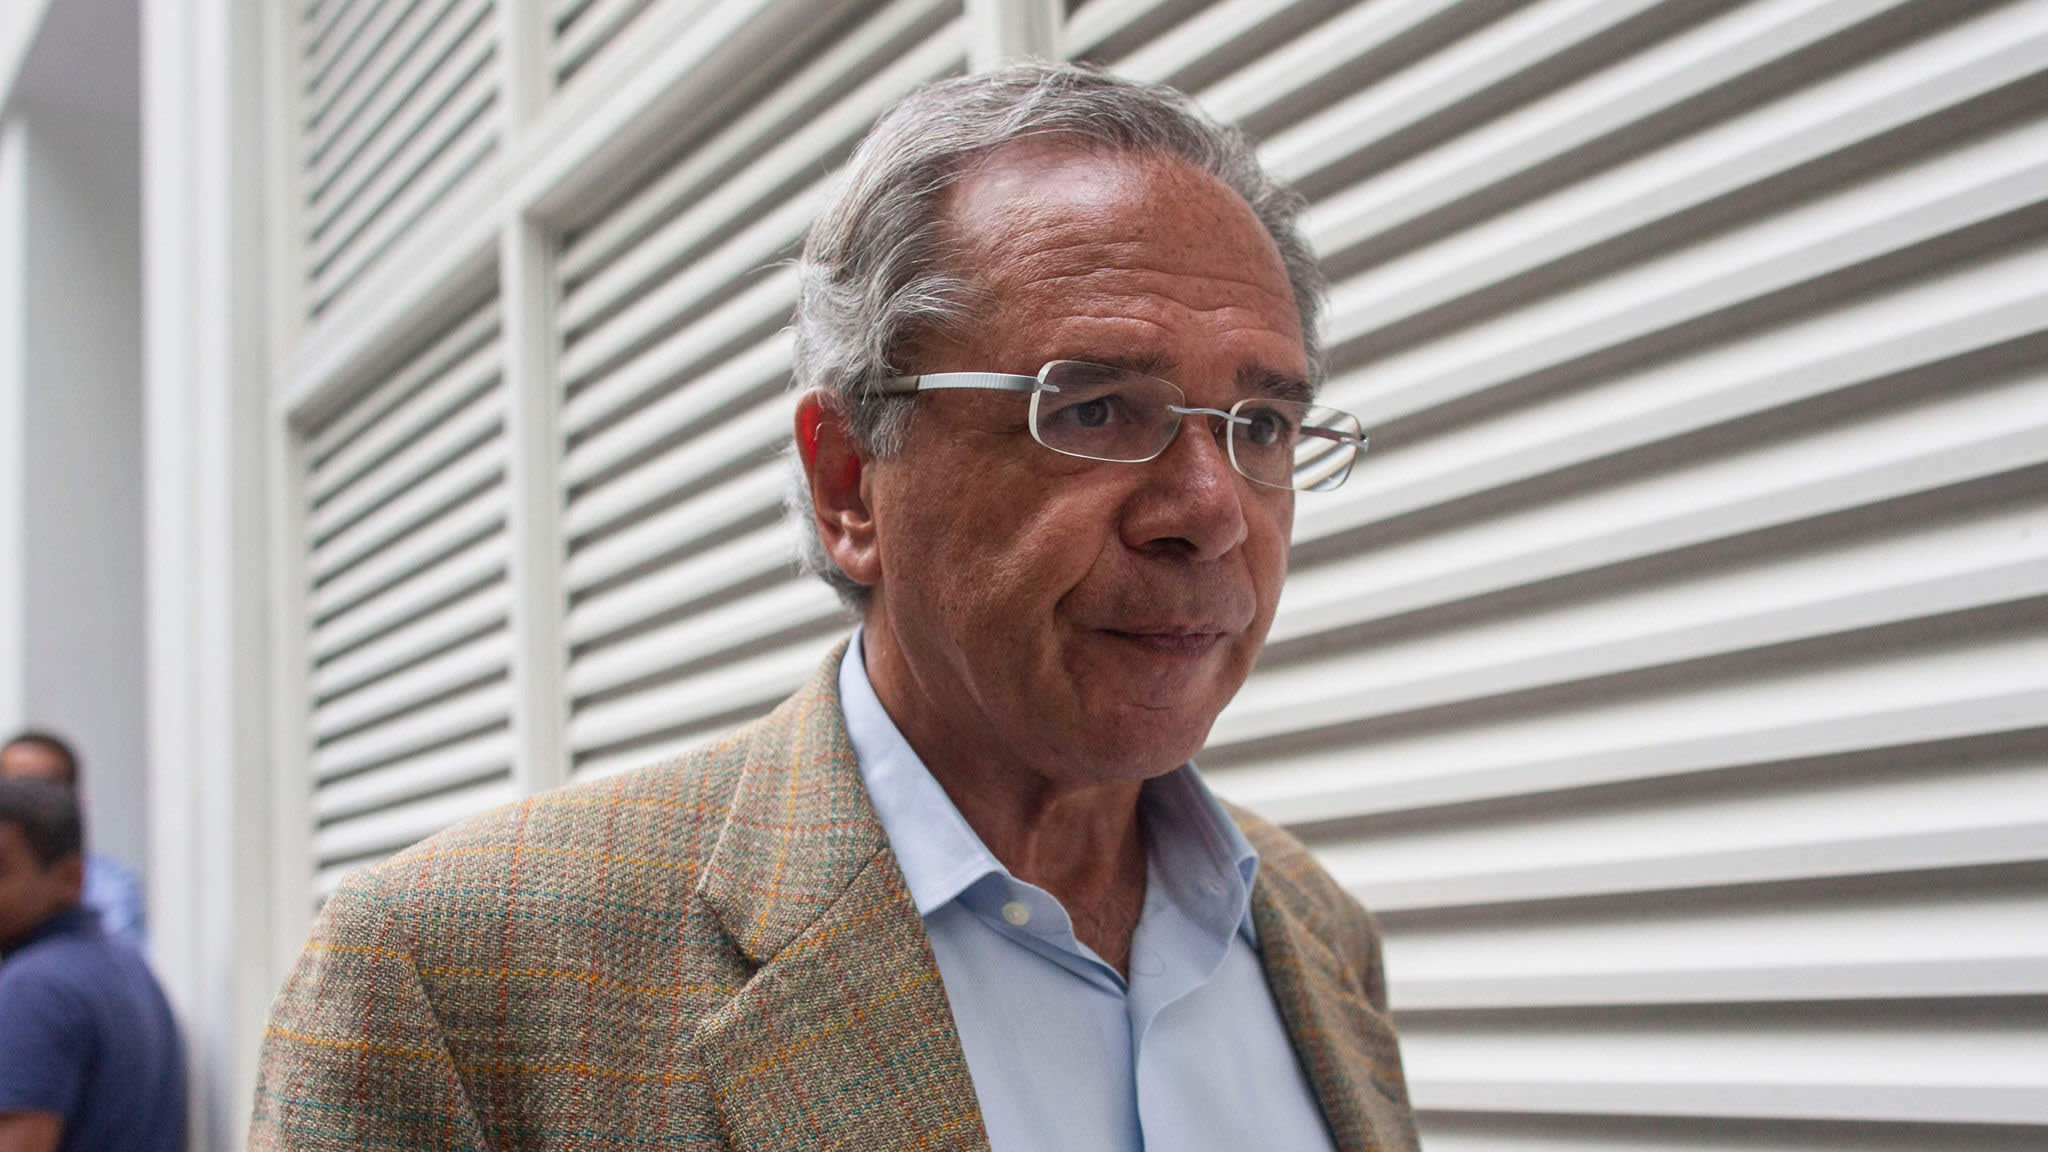 Brazil's new finance minister eyes 'Pinochet-style' fix for economy